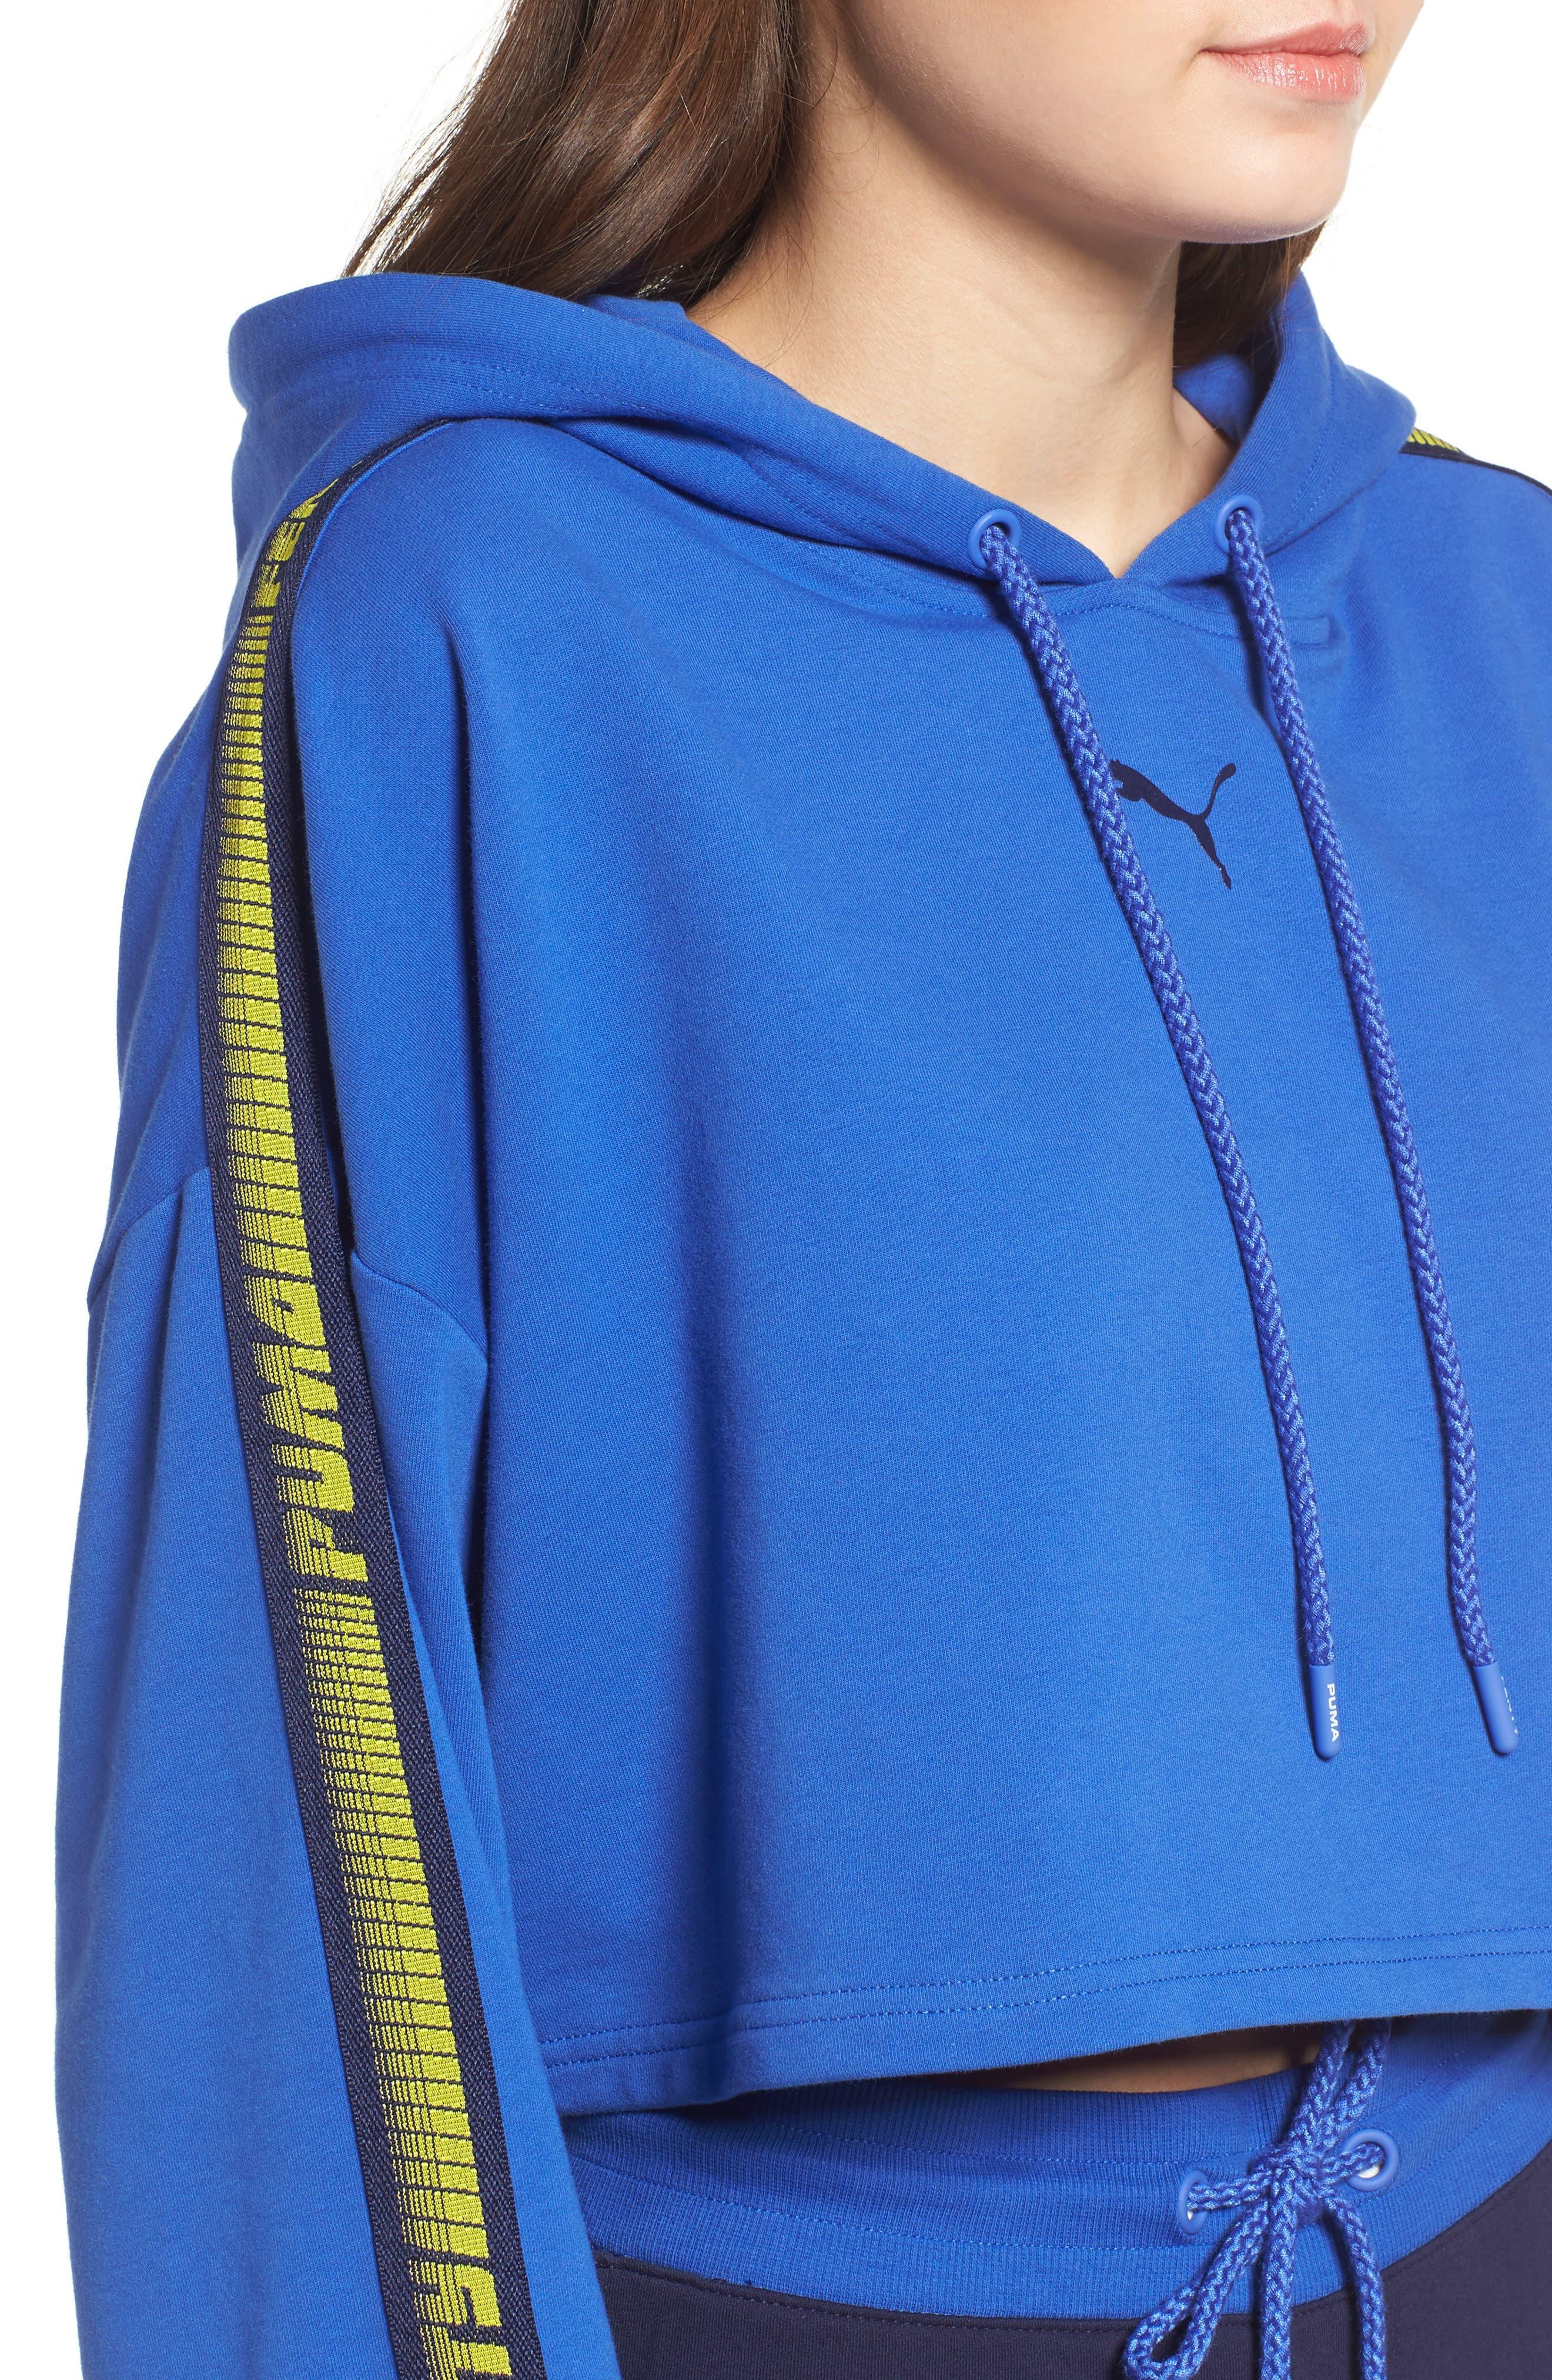 FENTY PUMA by Rihanna Hooded Crop Sweatshirt,                             Alternate thumbnail 4, color,                             Dazzling Blue